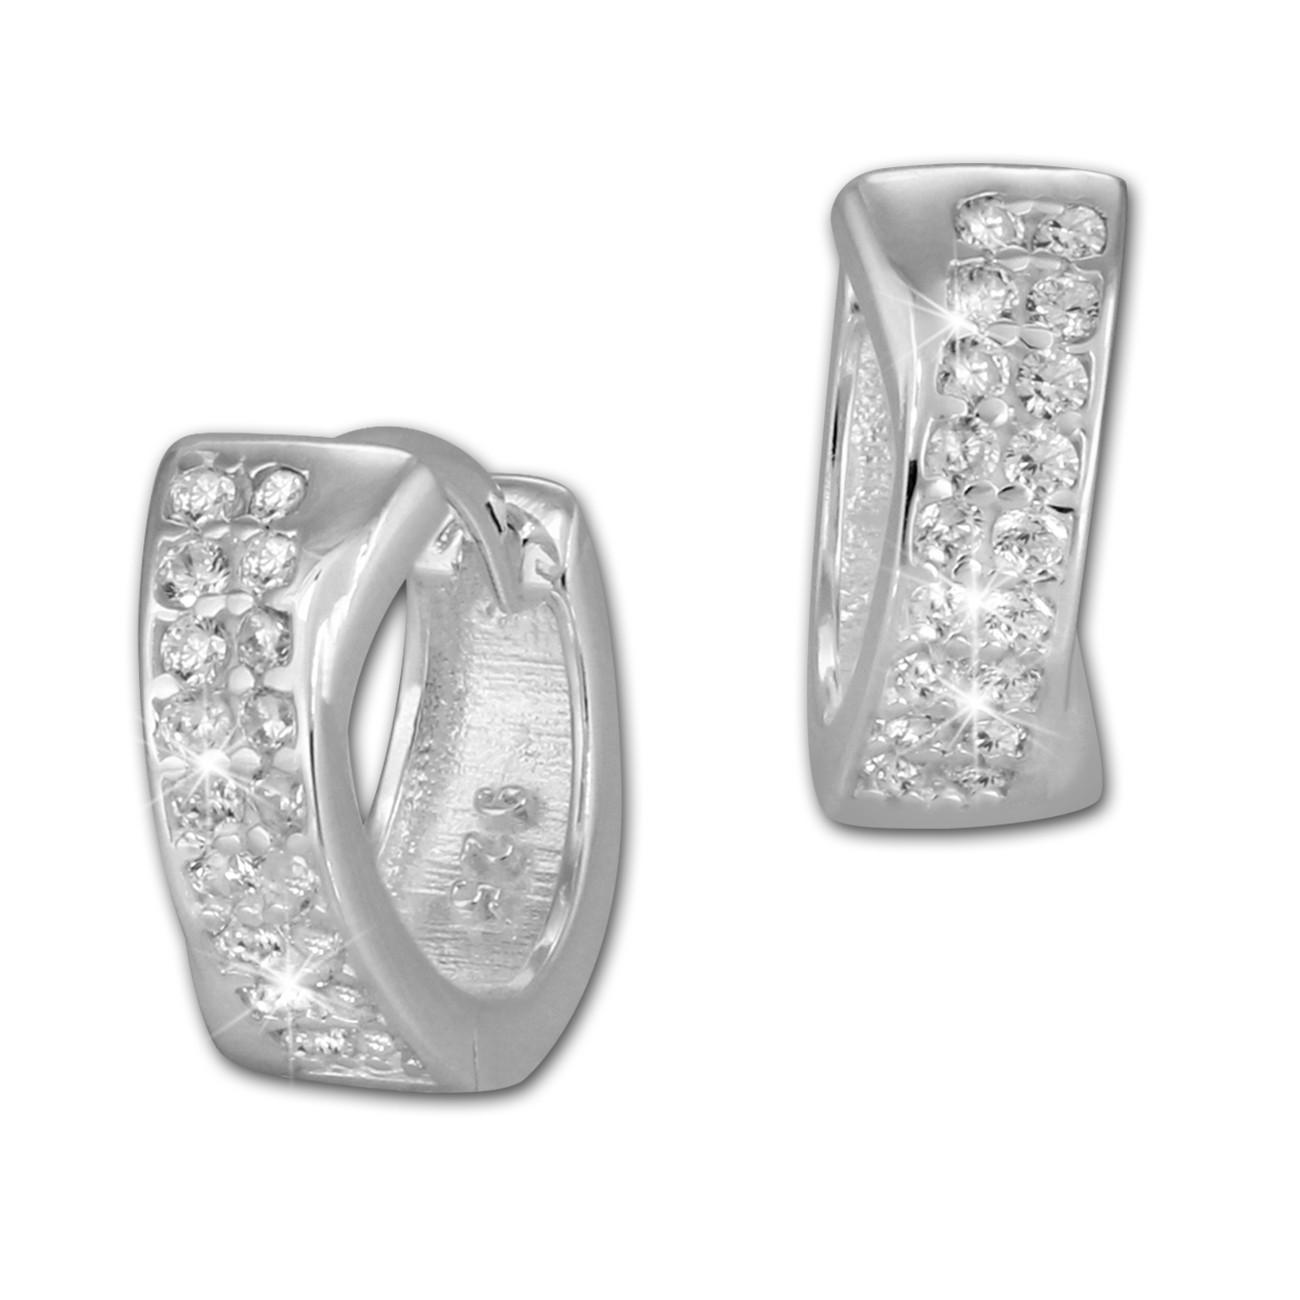 SilberDream Creole 2-reihig Zirkonia weiß 925er Silber Damen SDO394W